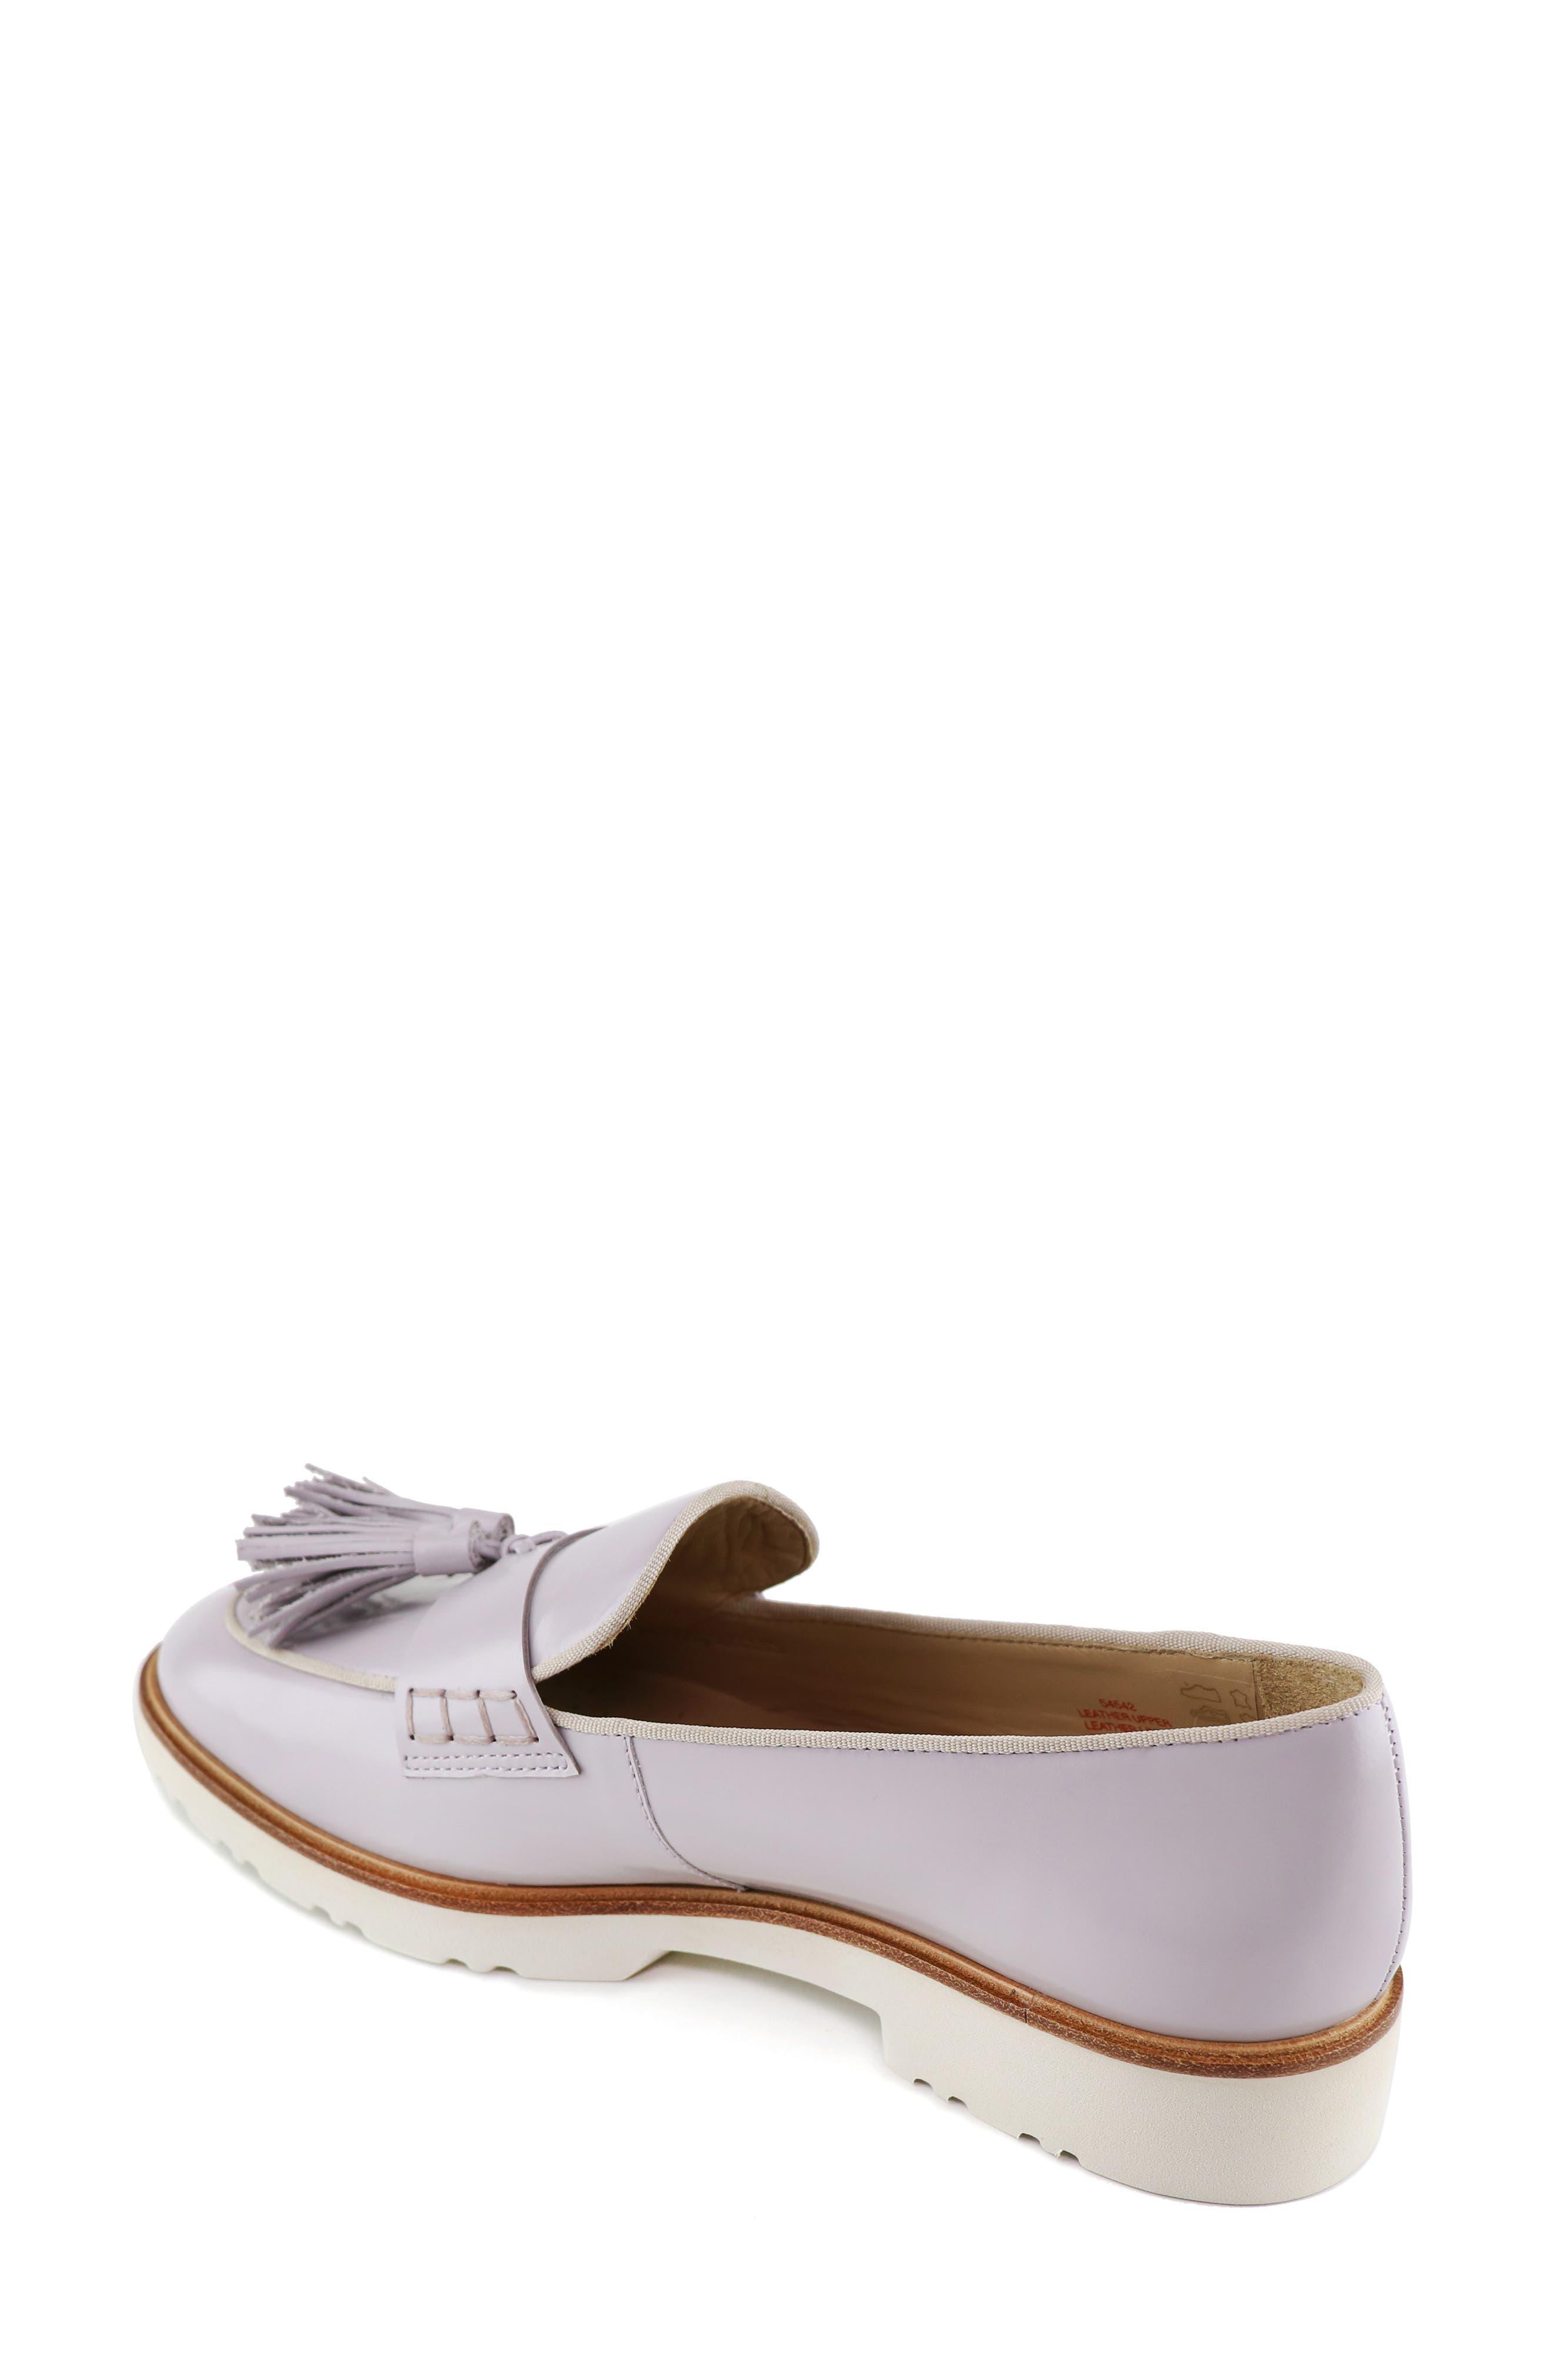 Athena Loafer